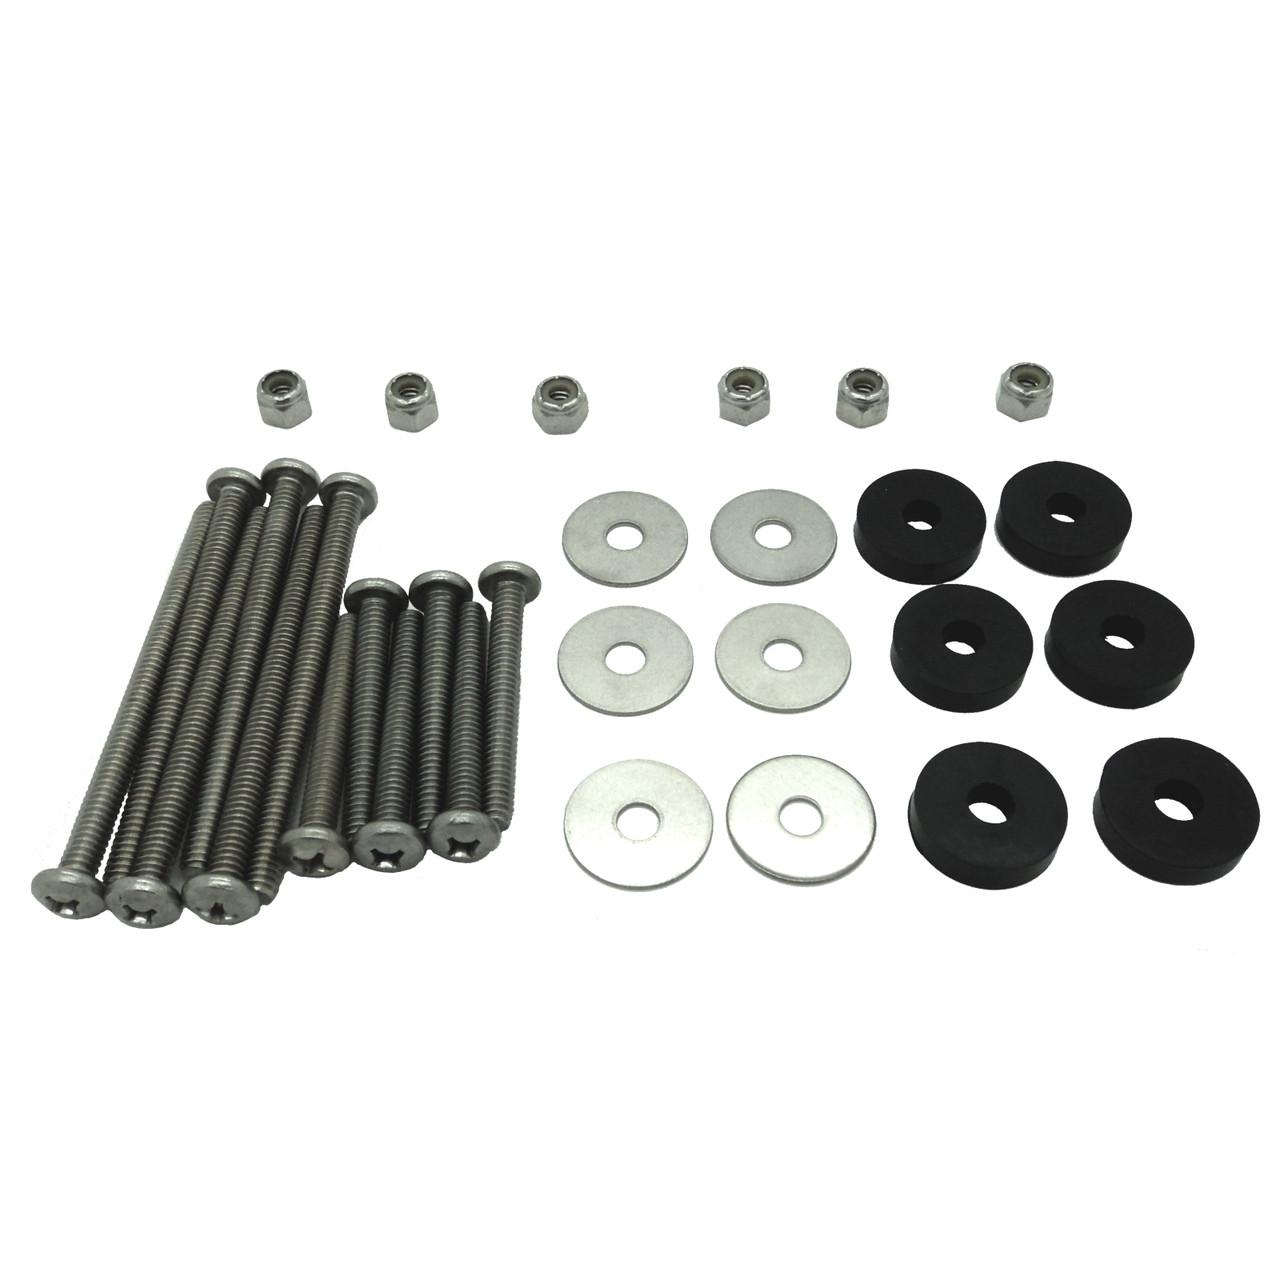 Minn Kota Trolling Motors >> Minn Kota Trolling Motor Universal Stainless Steel Mounting Kit